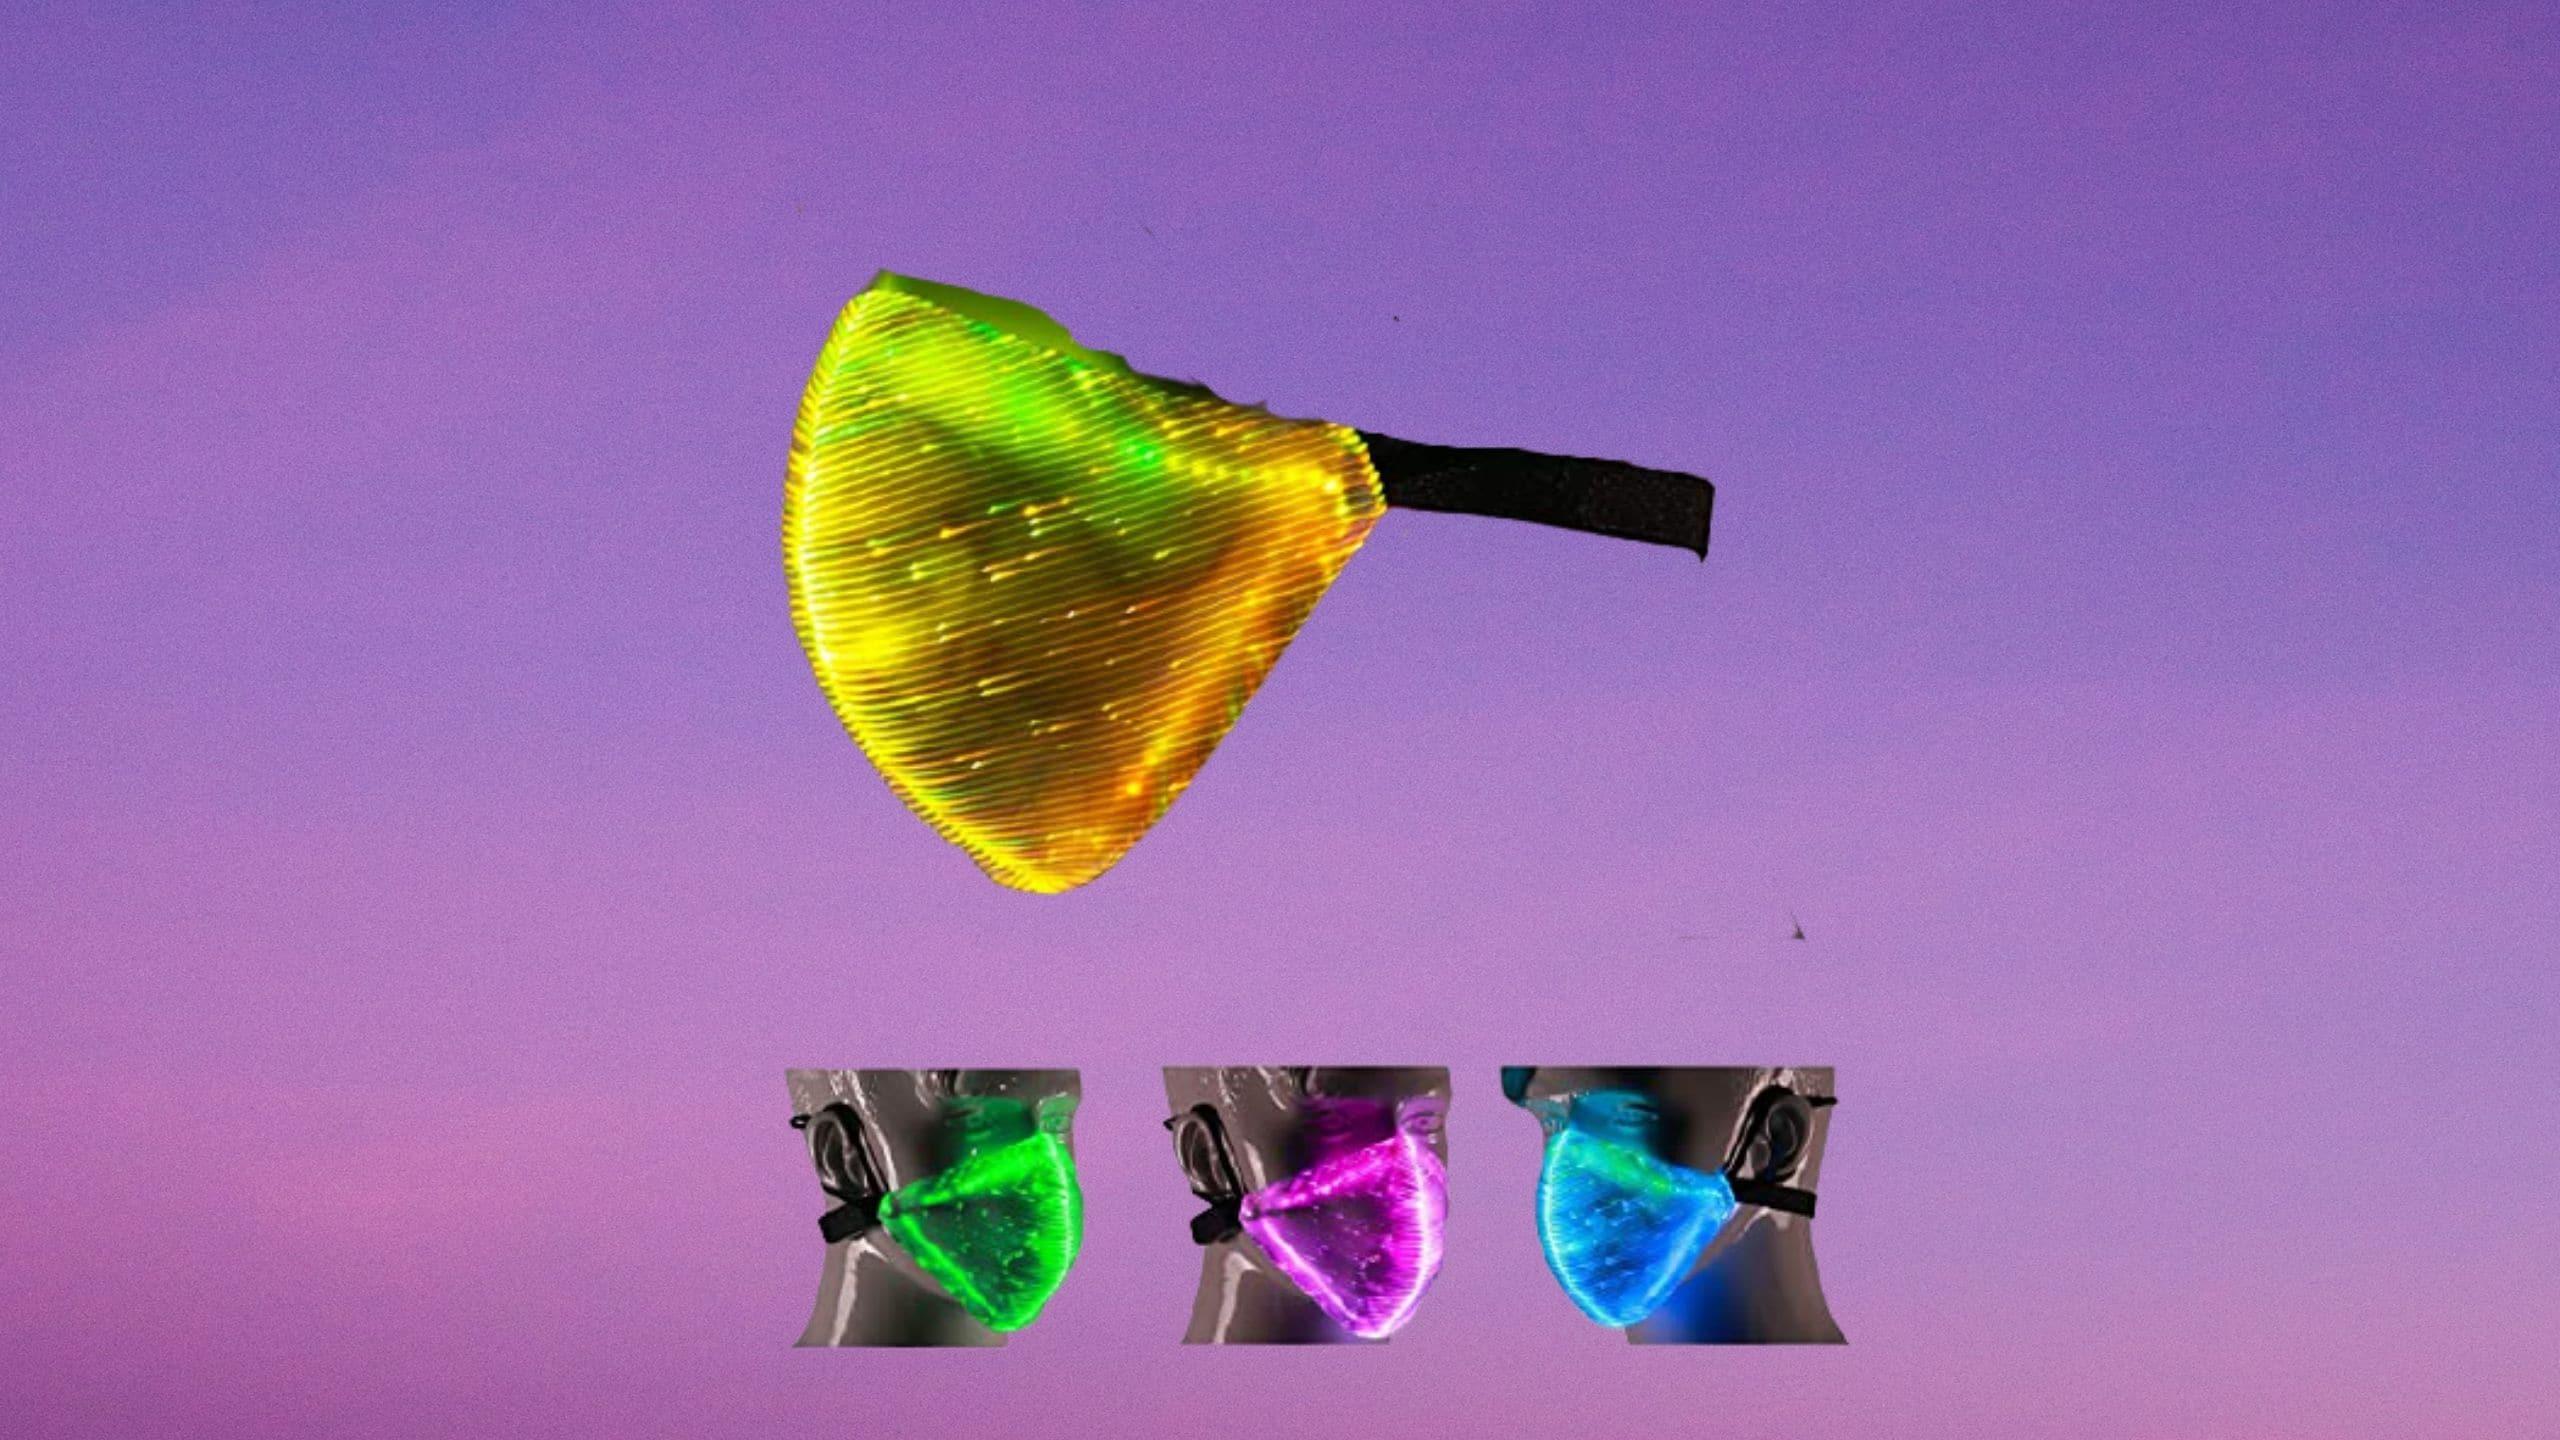 TECZERO's multi-color LED light-up Face Mask